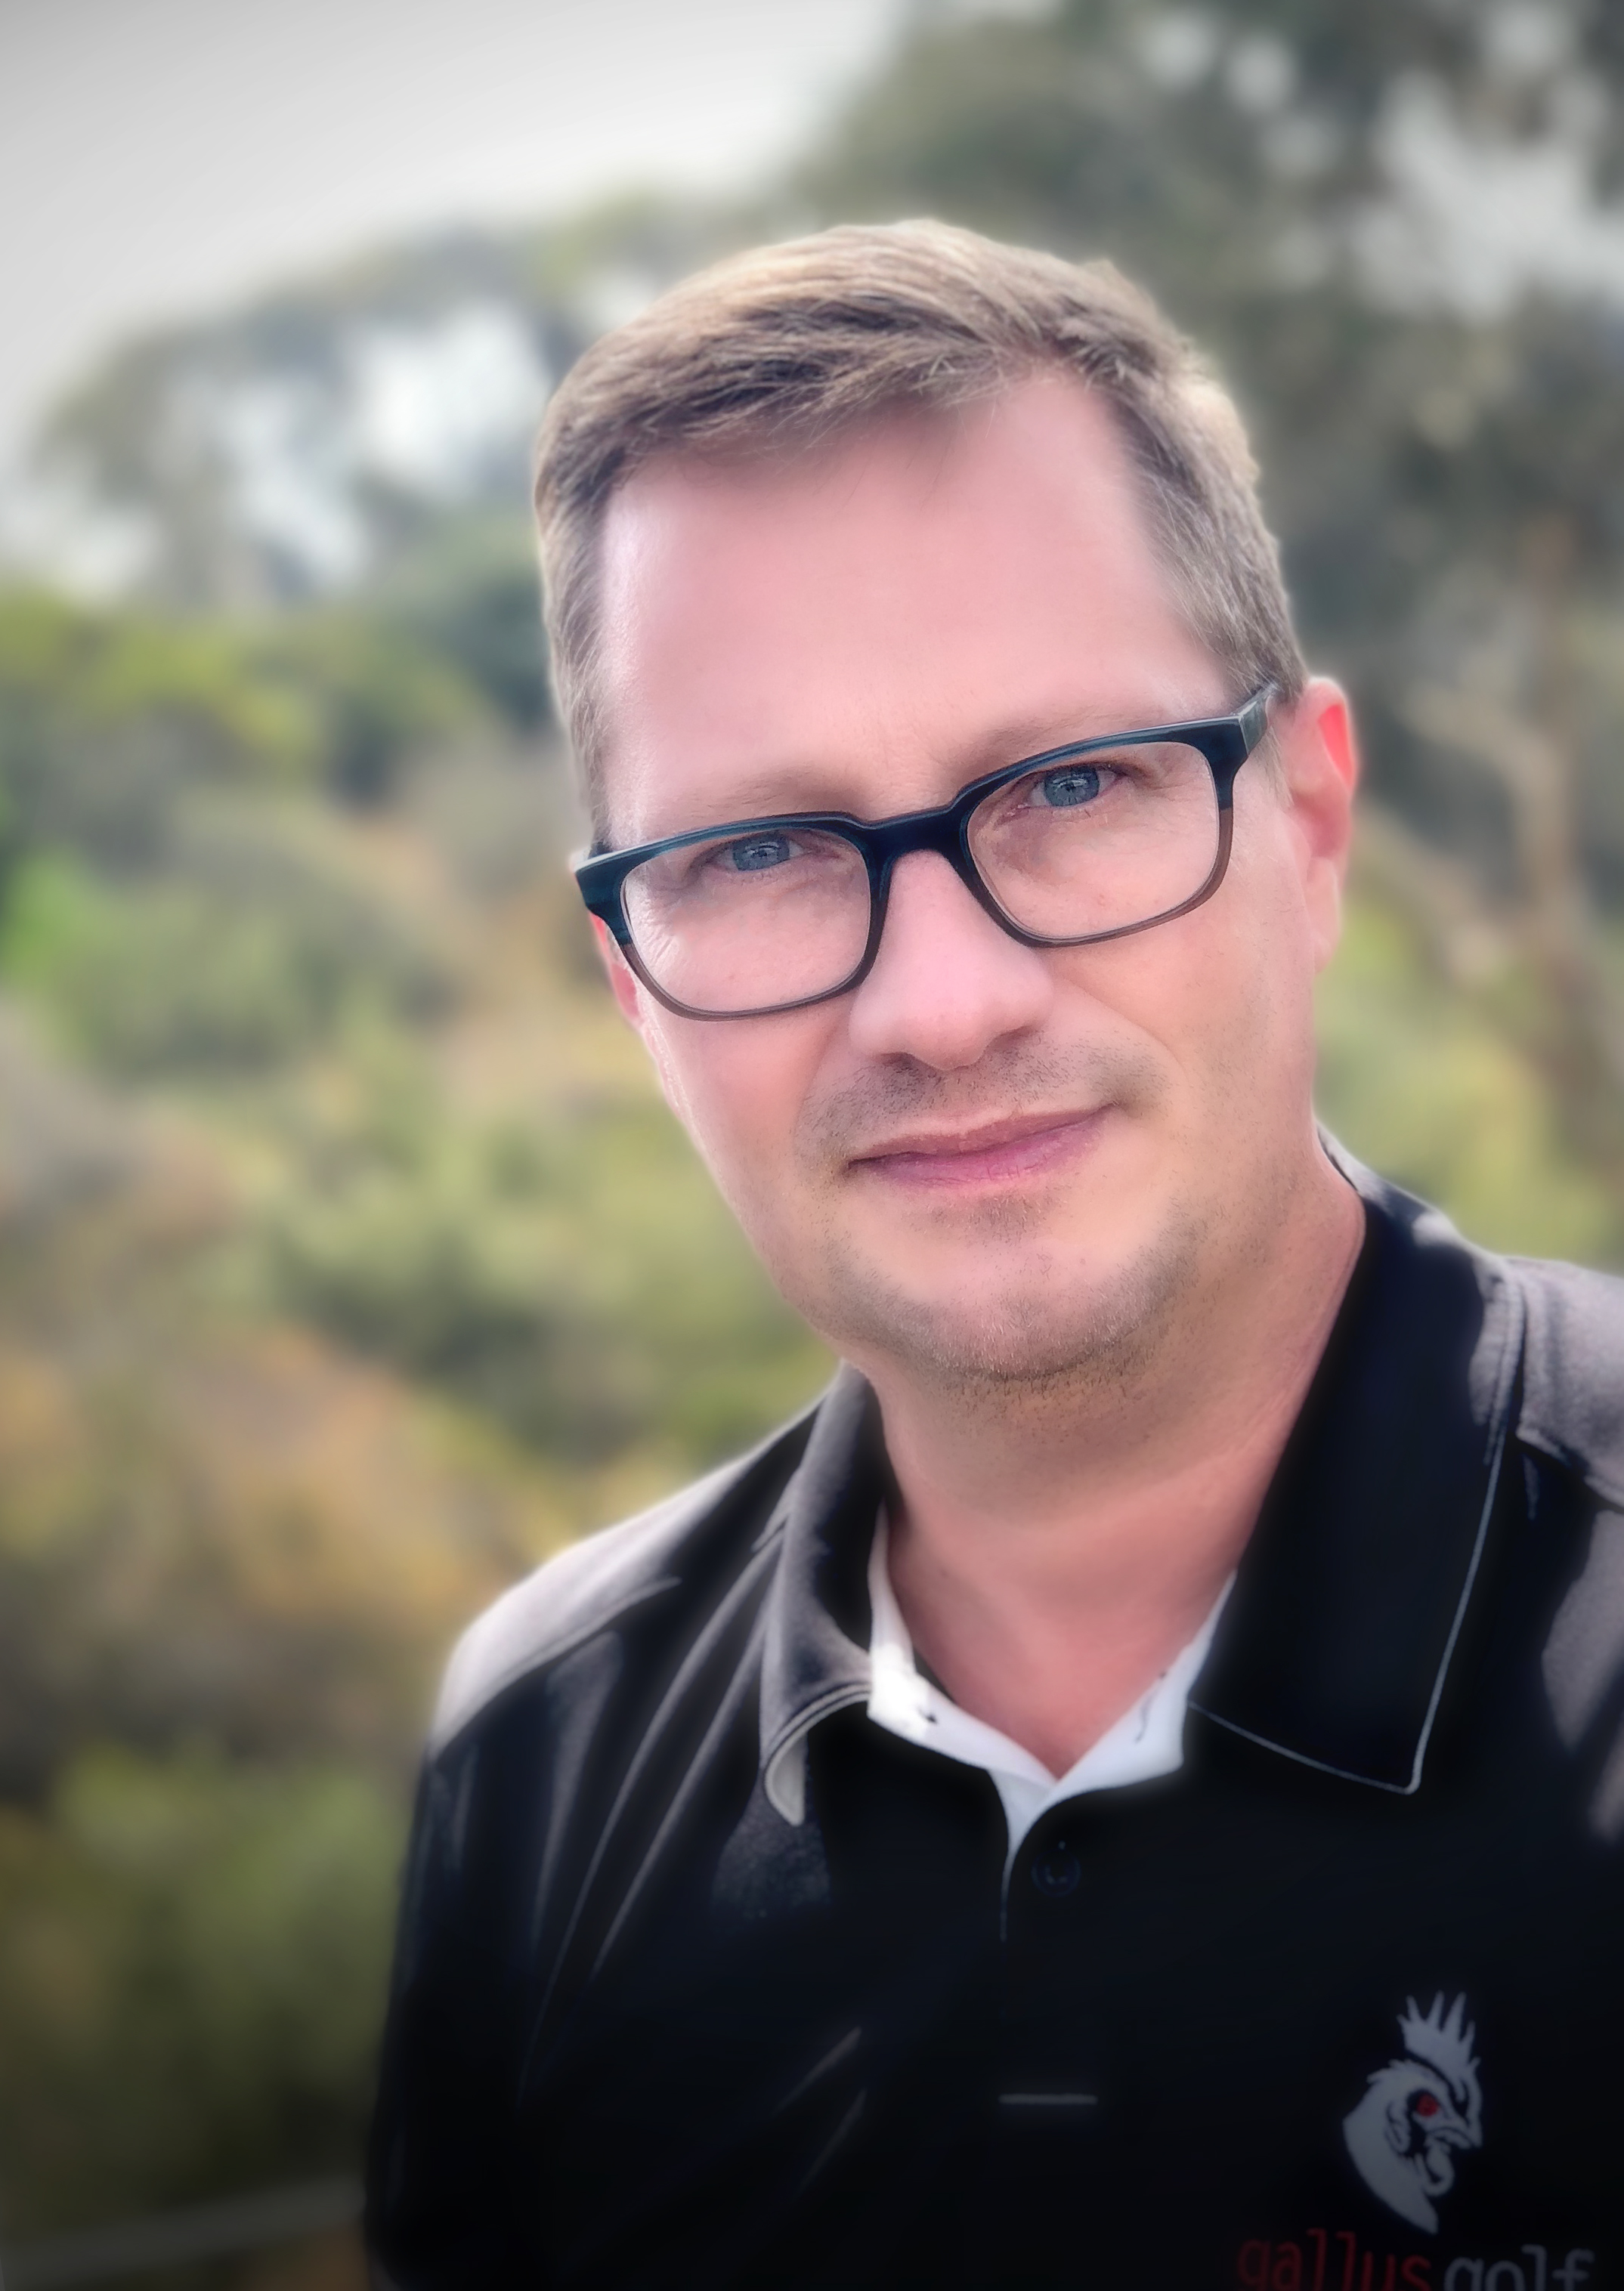 Rob Hoffman - VP of Sales & Marketing